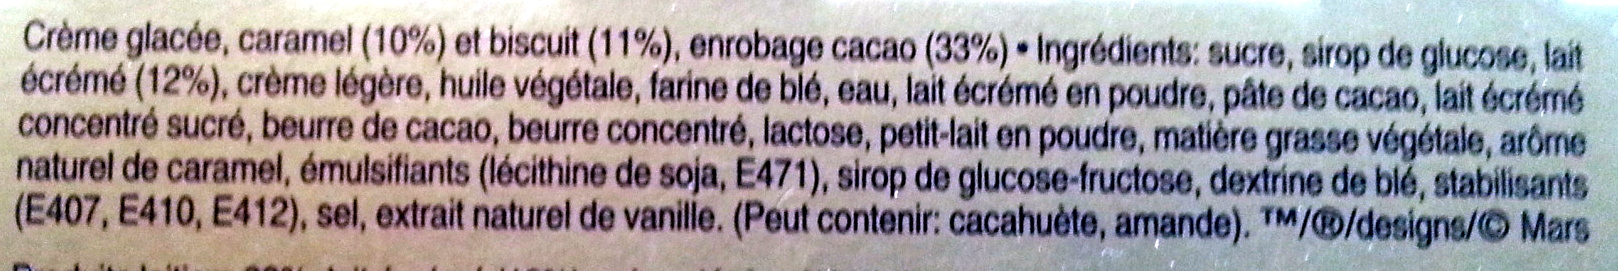 Twix barres glacées - Ingredientes - fr